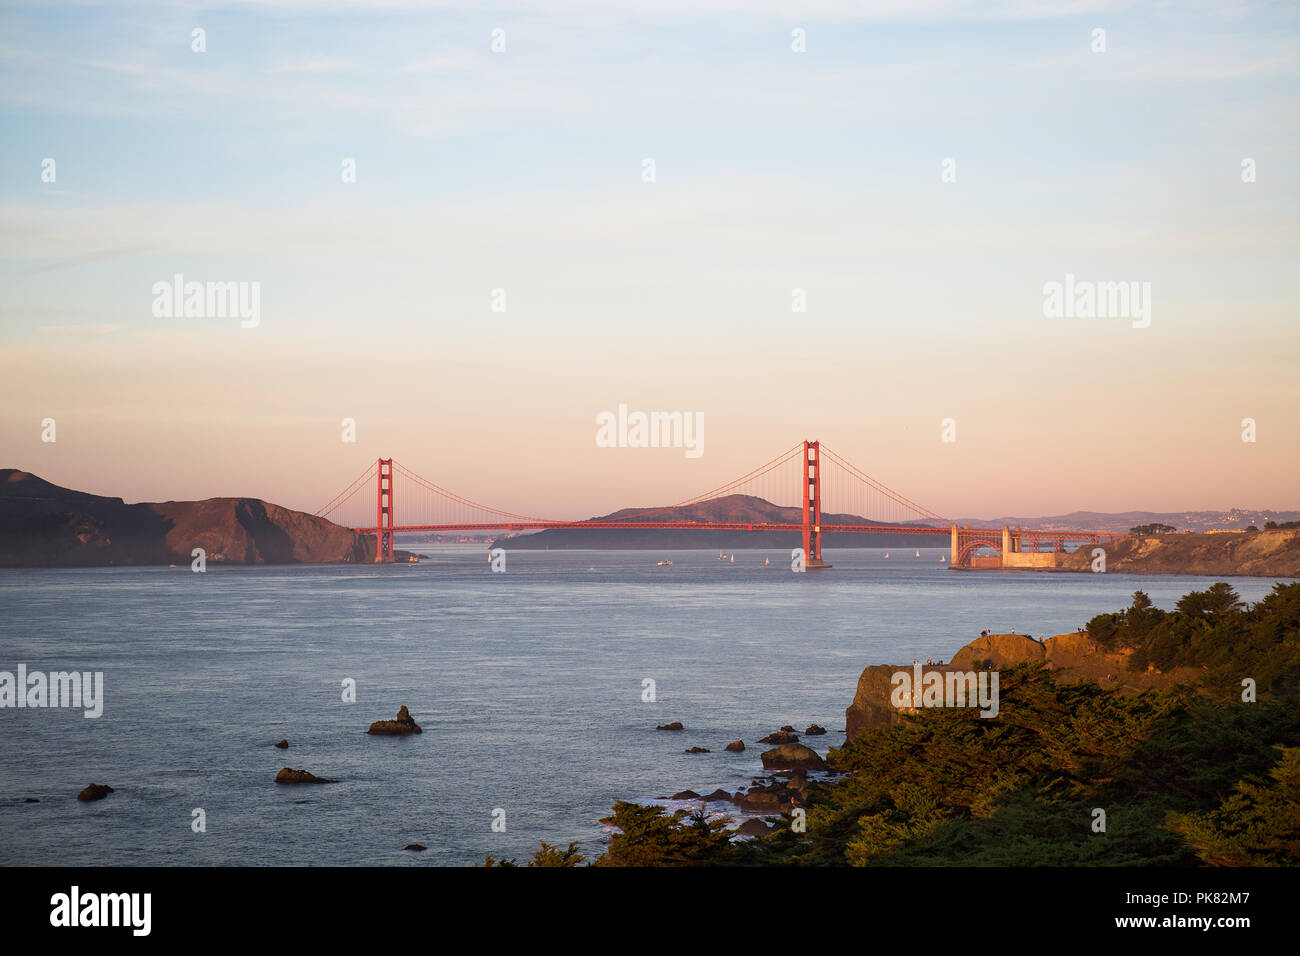 Golden Gate Bridge at Sunset Photo Stock